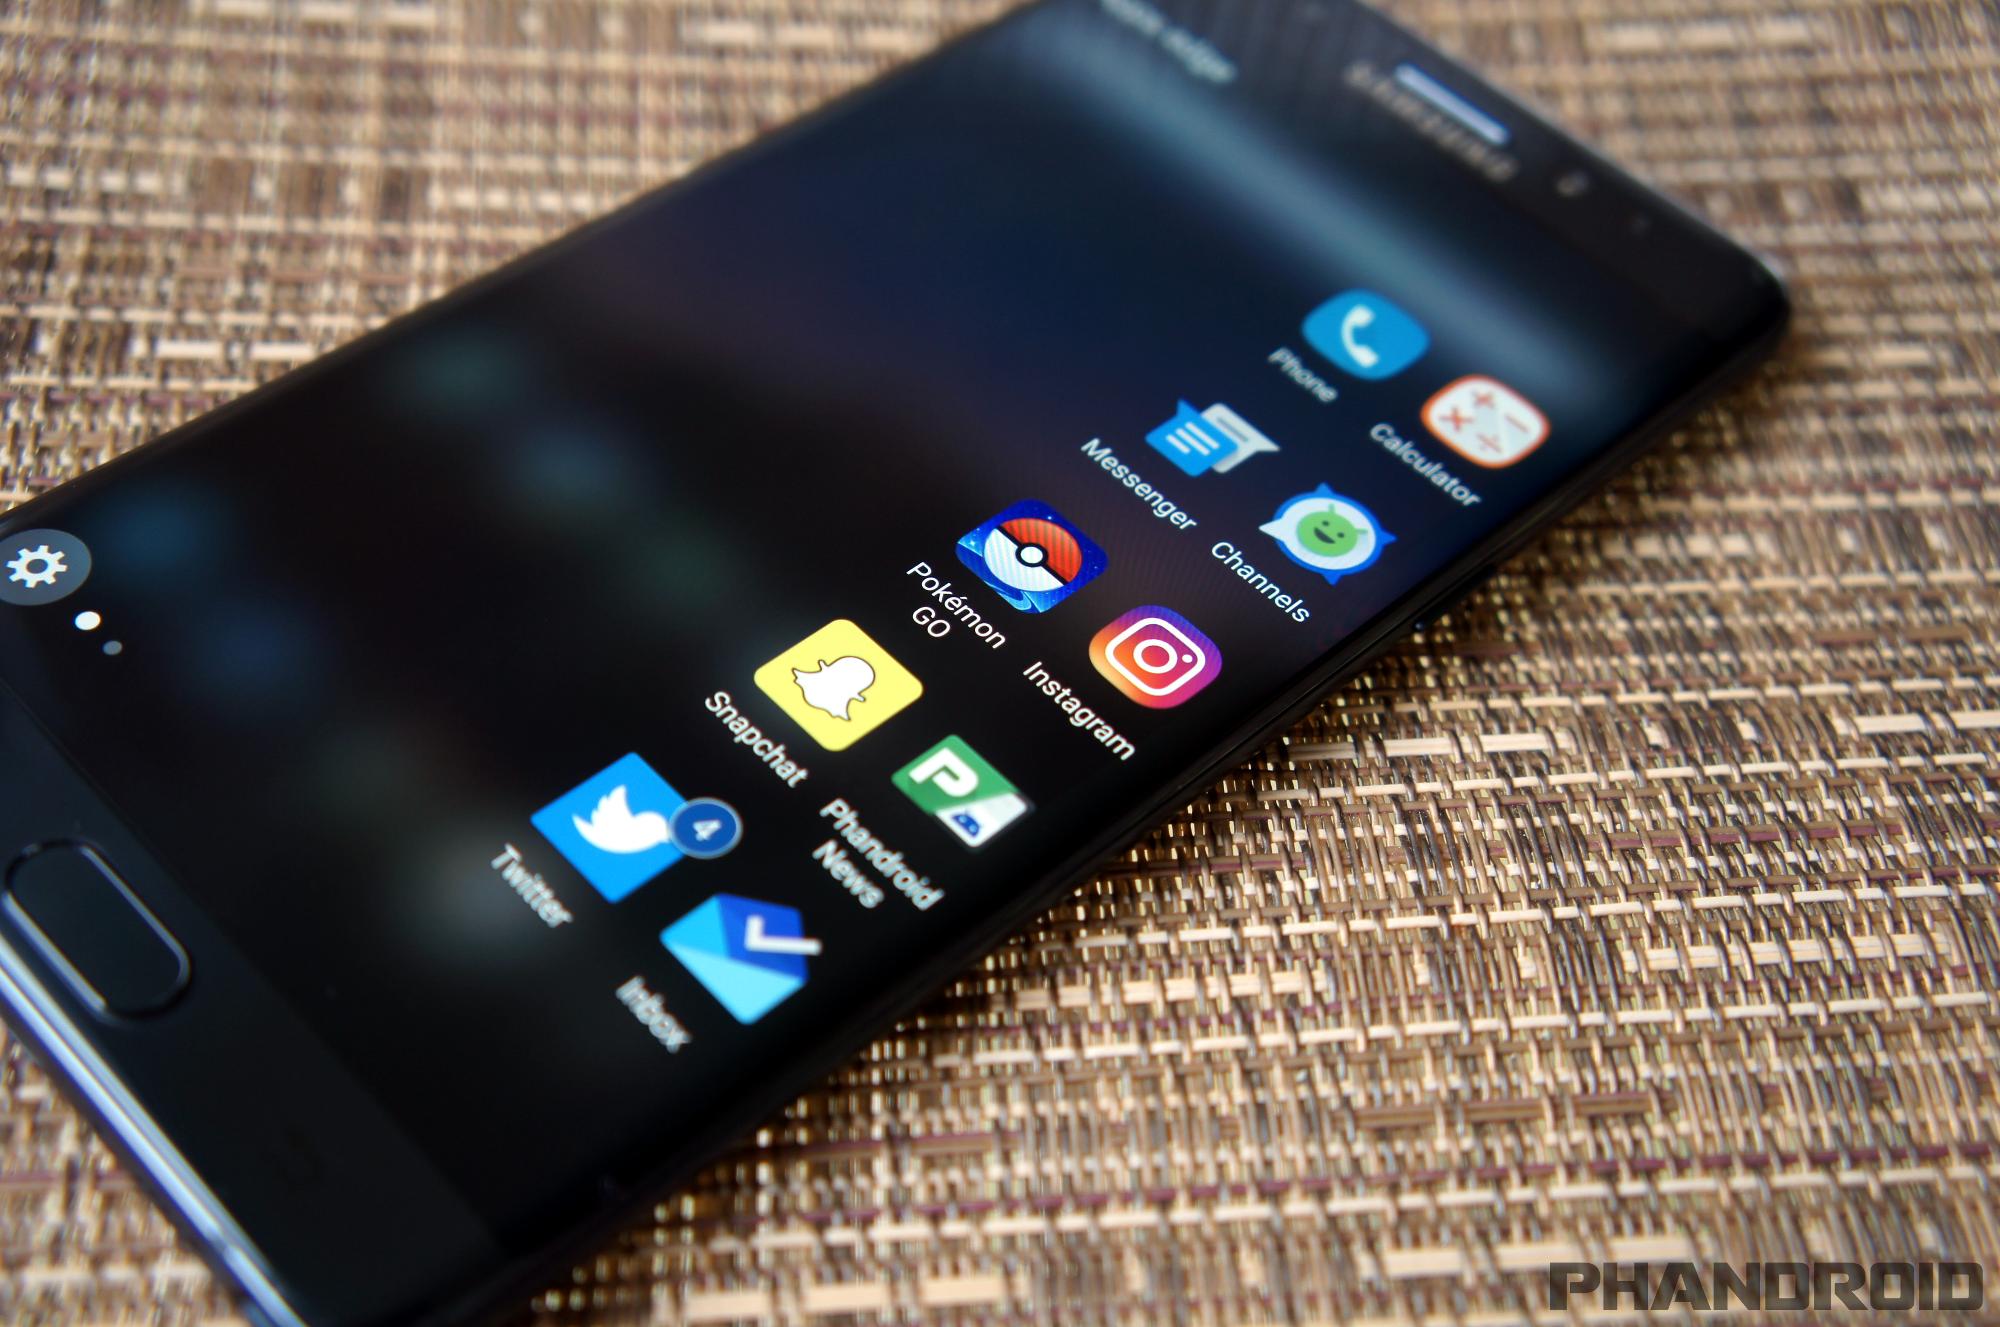 iPhone 7 Plus vs Galaxy Note 7 vs LG V20 vs Nexus 6P [CHART]